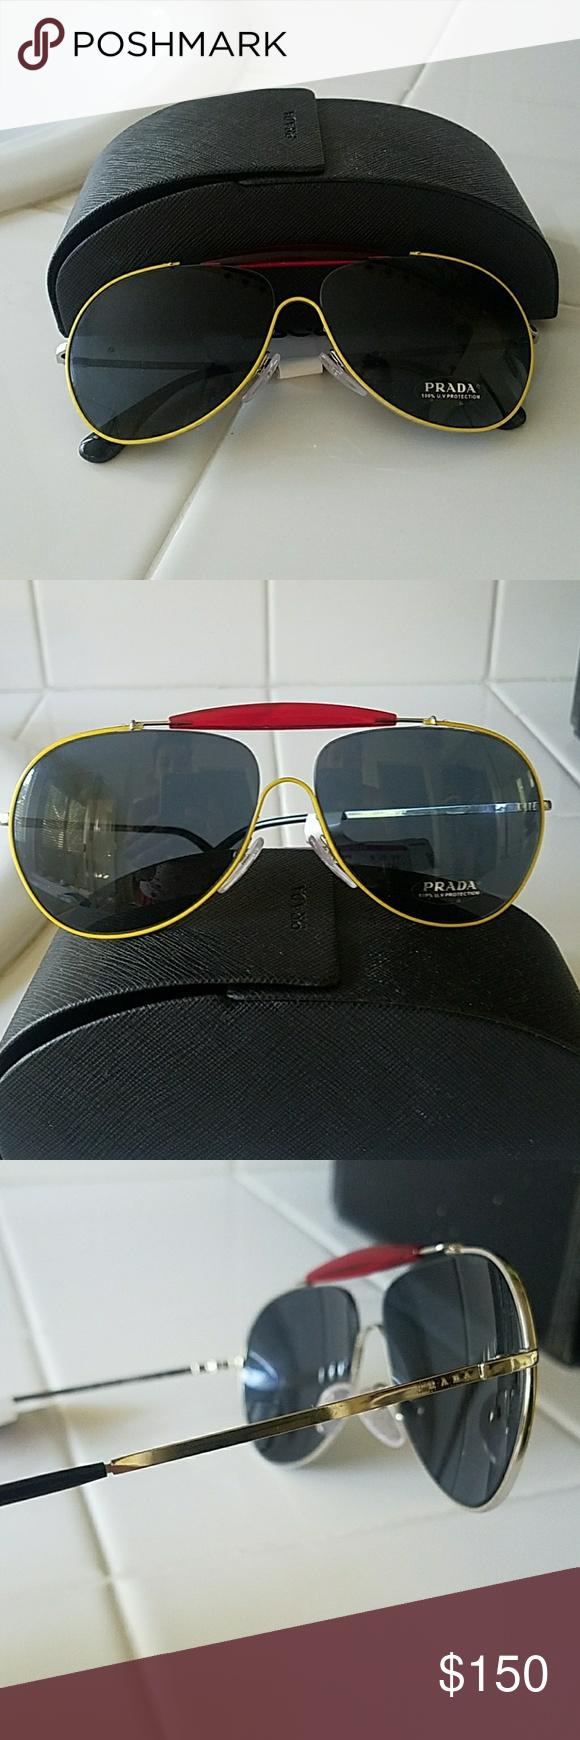 42443b24b3b Very cute unusual Prada sunglasses. Brand New (no tags) Aviator style  Silver